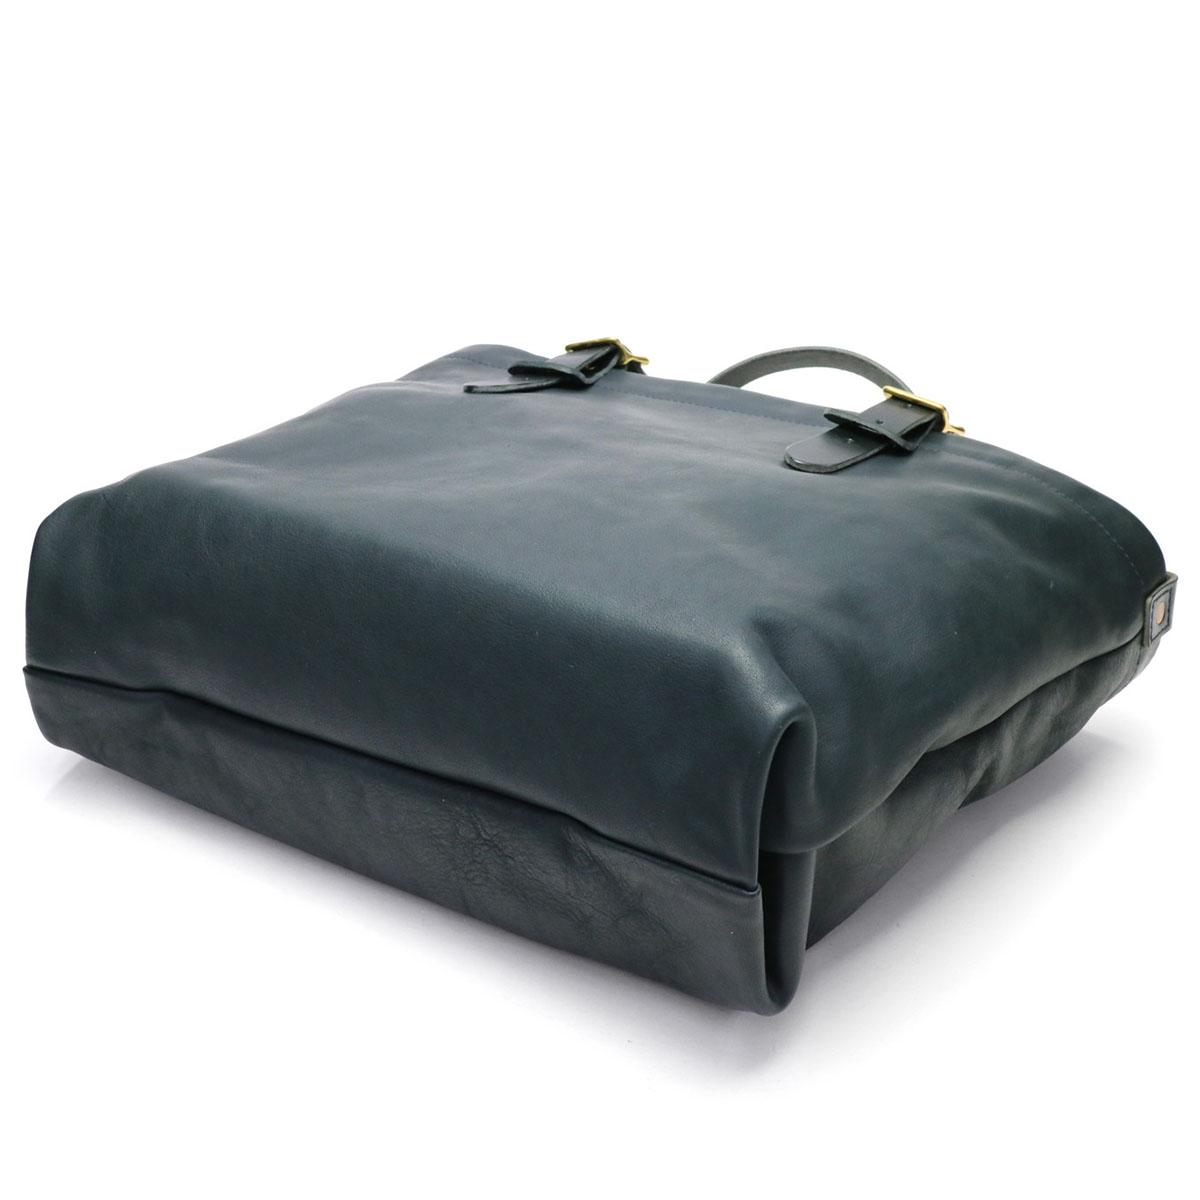 Bespoke SLOW rubono 2WAY tote bag men's ladies Tochigi leather 300S30CG